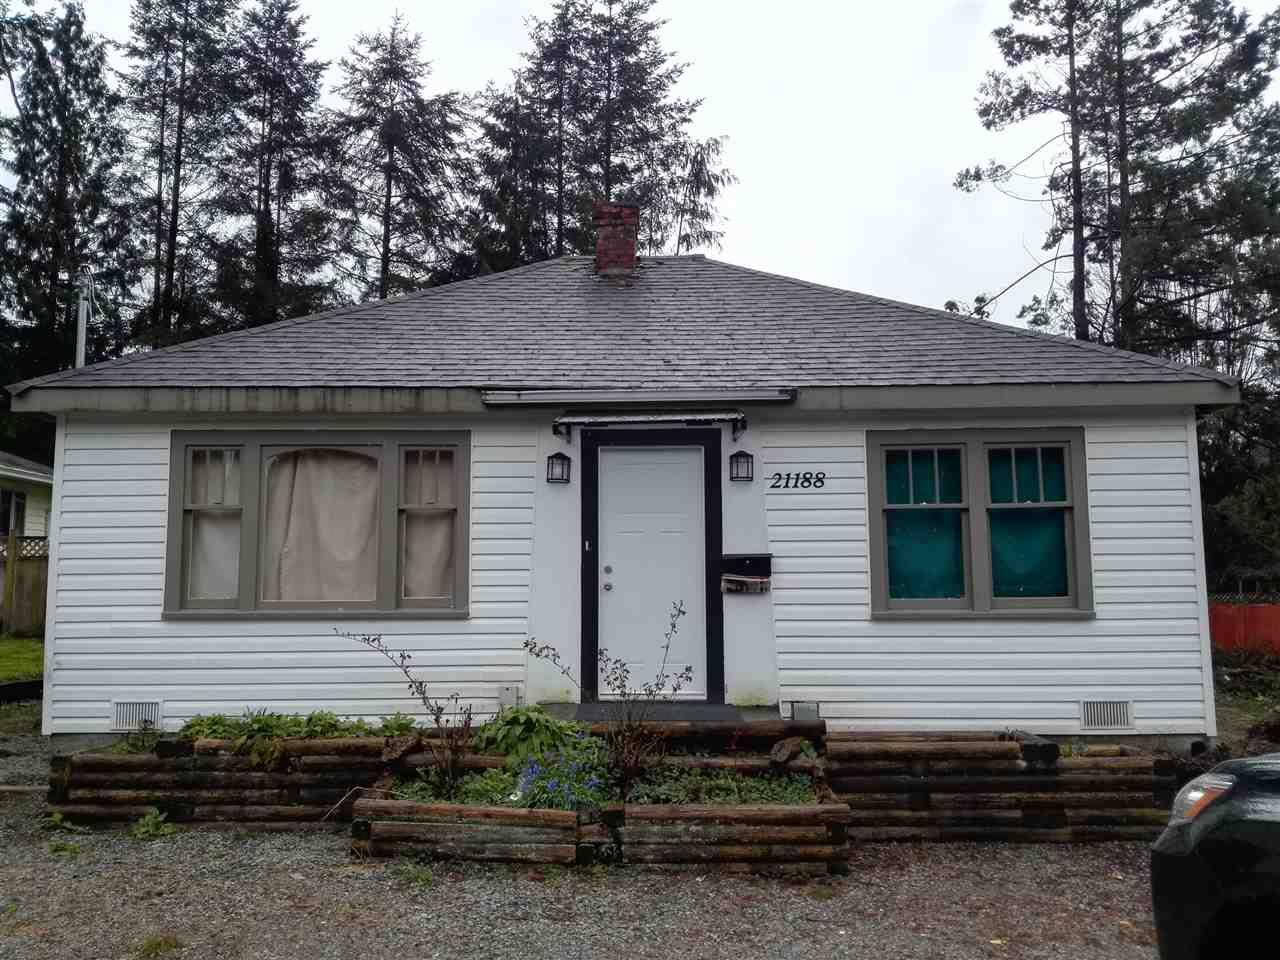 Main Photo: 21188 DEWDNEY TRUNK Road in Maple Ridge: Southwest Maple Ridge House for sale : MLS®# R2153839